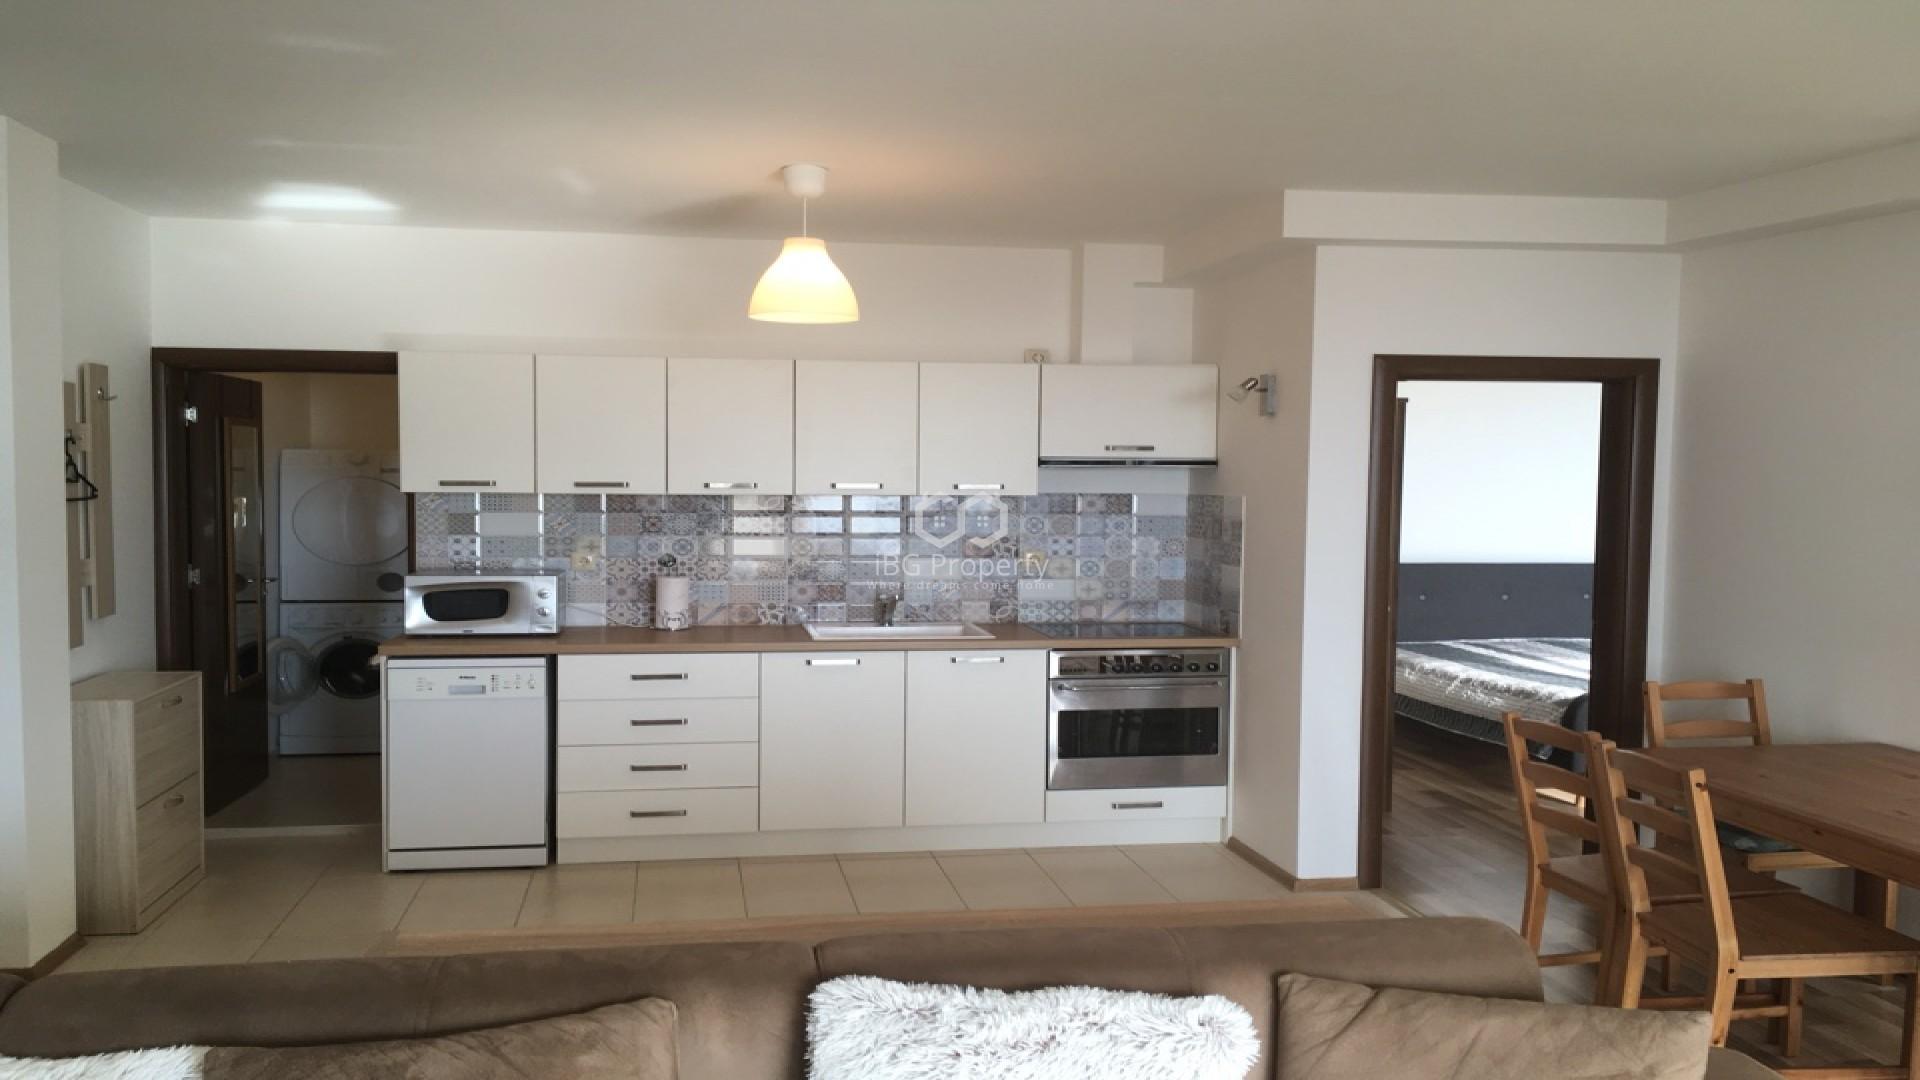 One bedroom apartment Briz Varna 71 m2